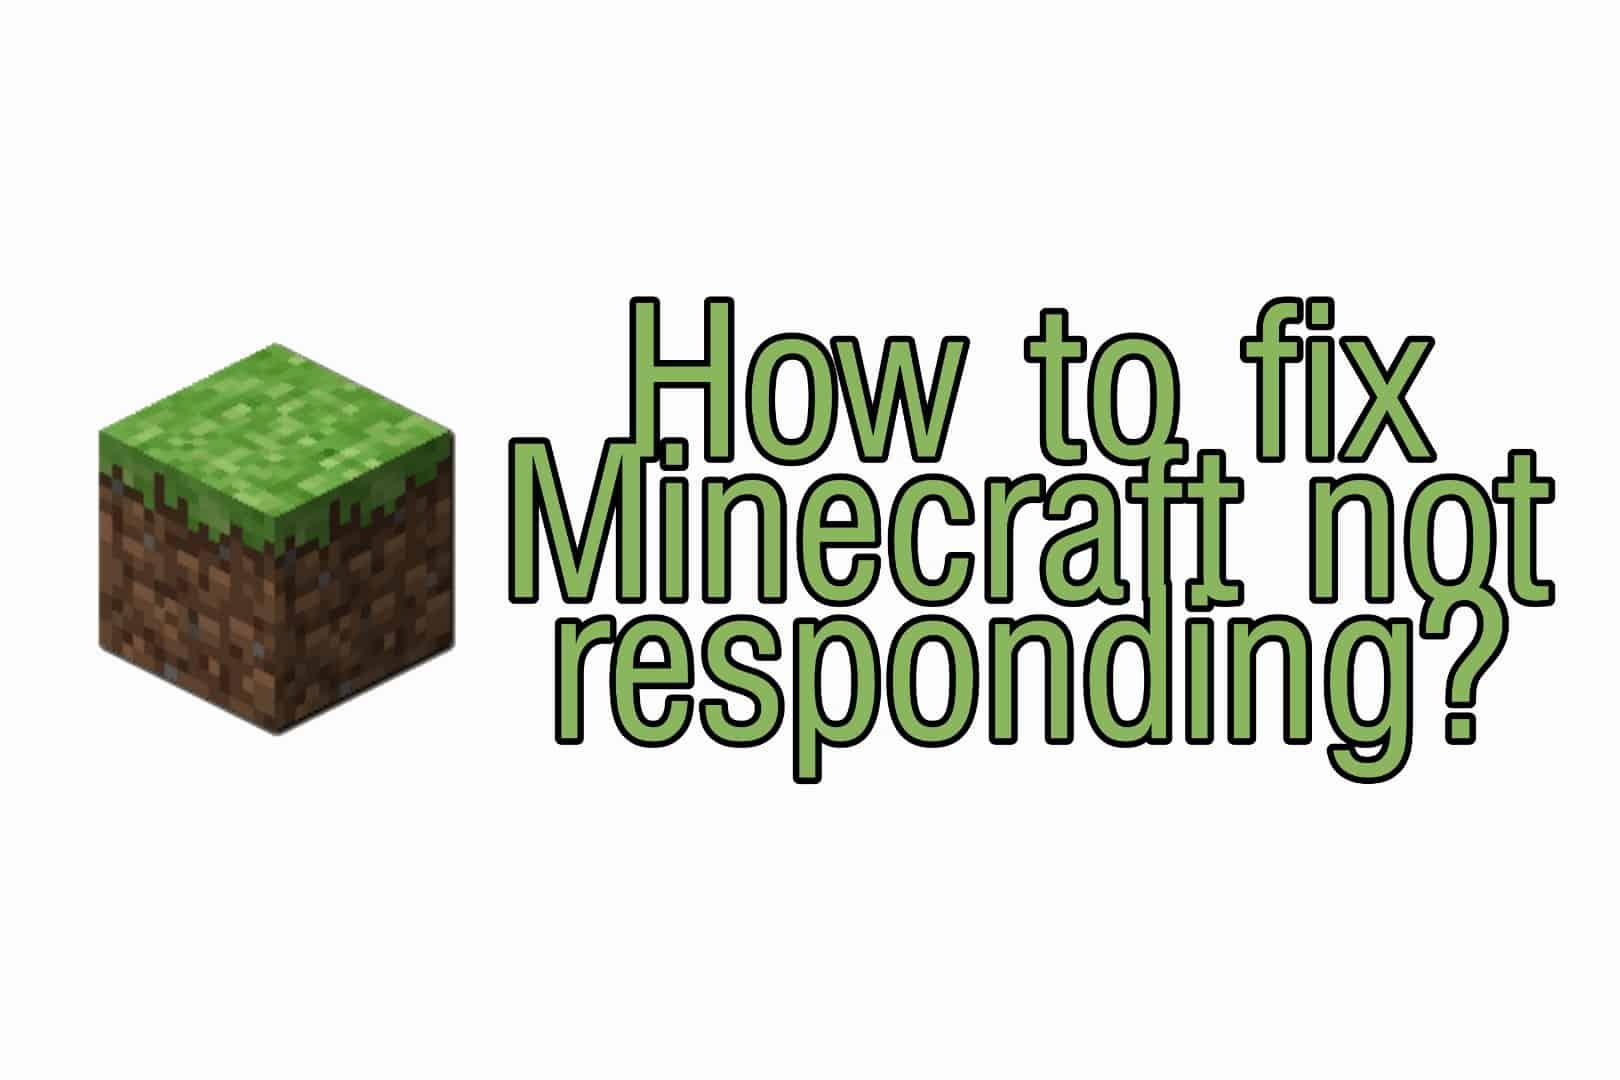 How to fix Minecraft not responding